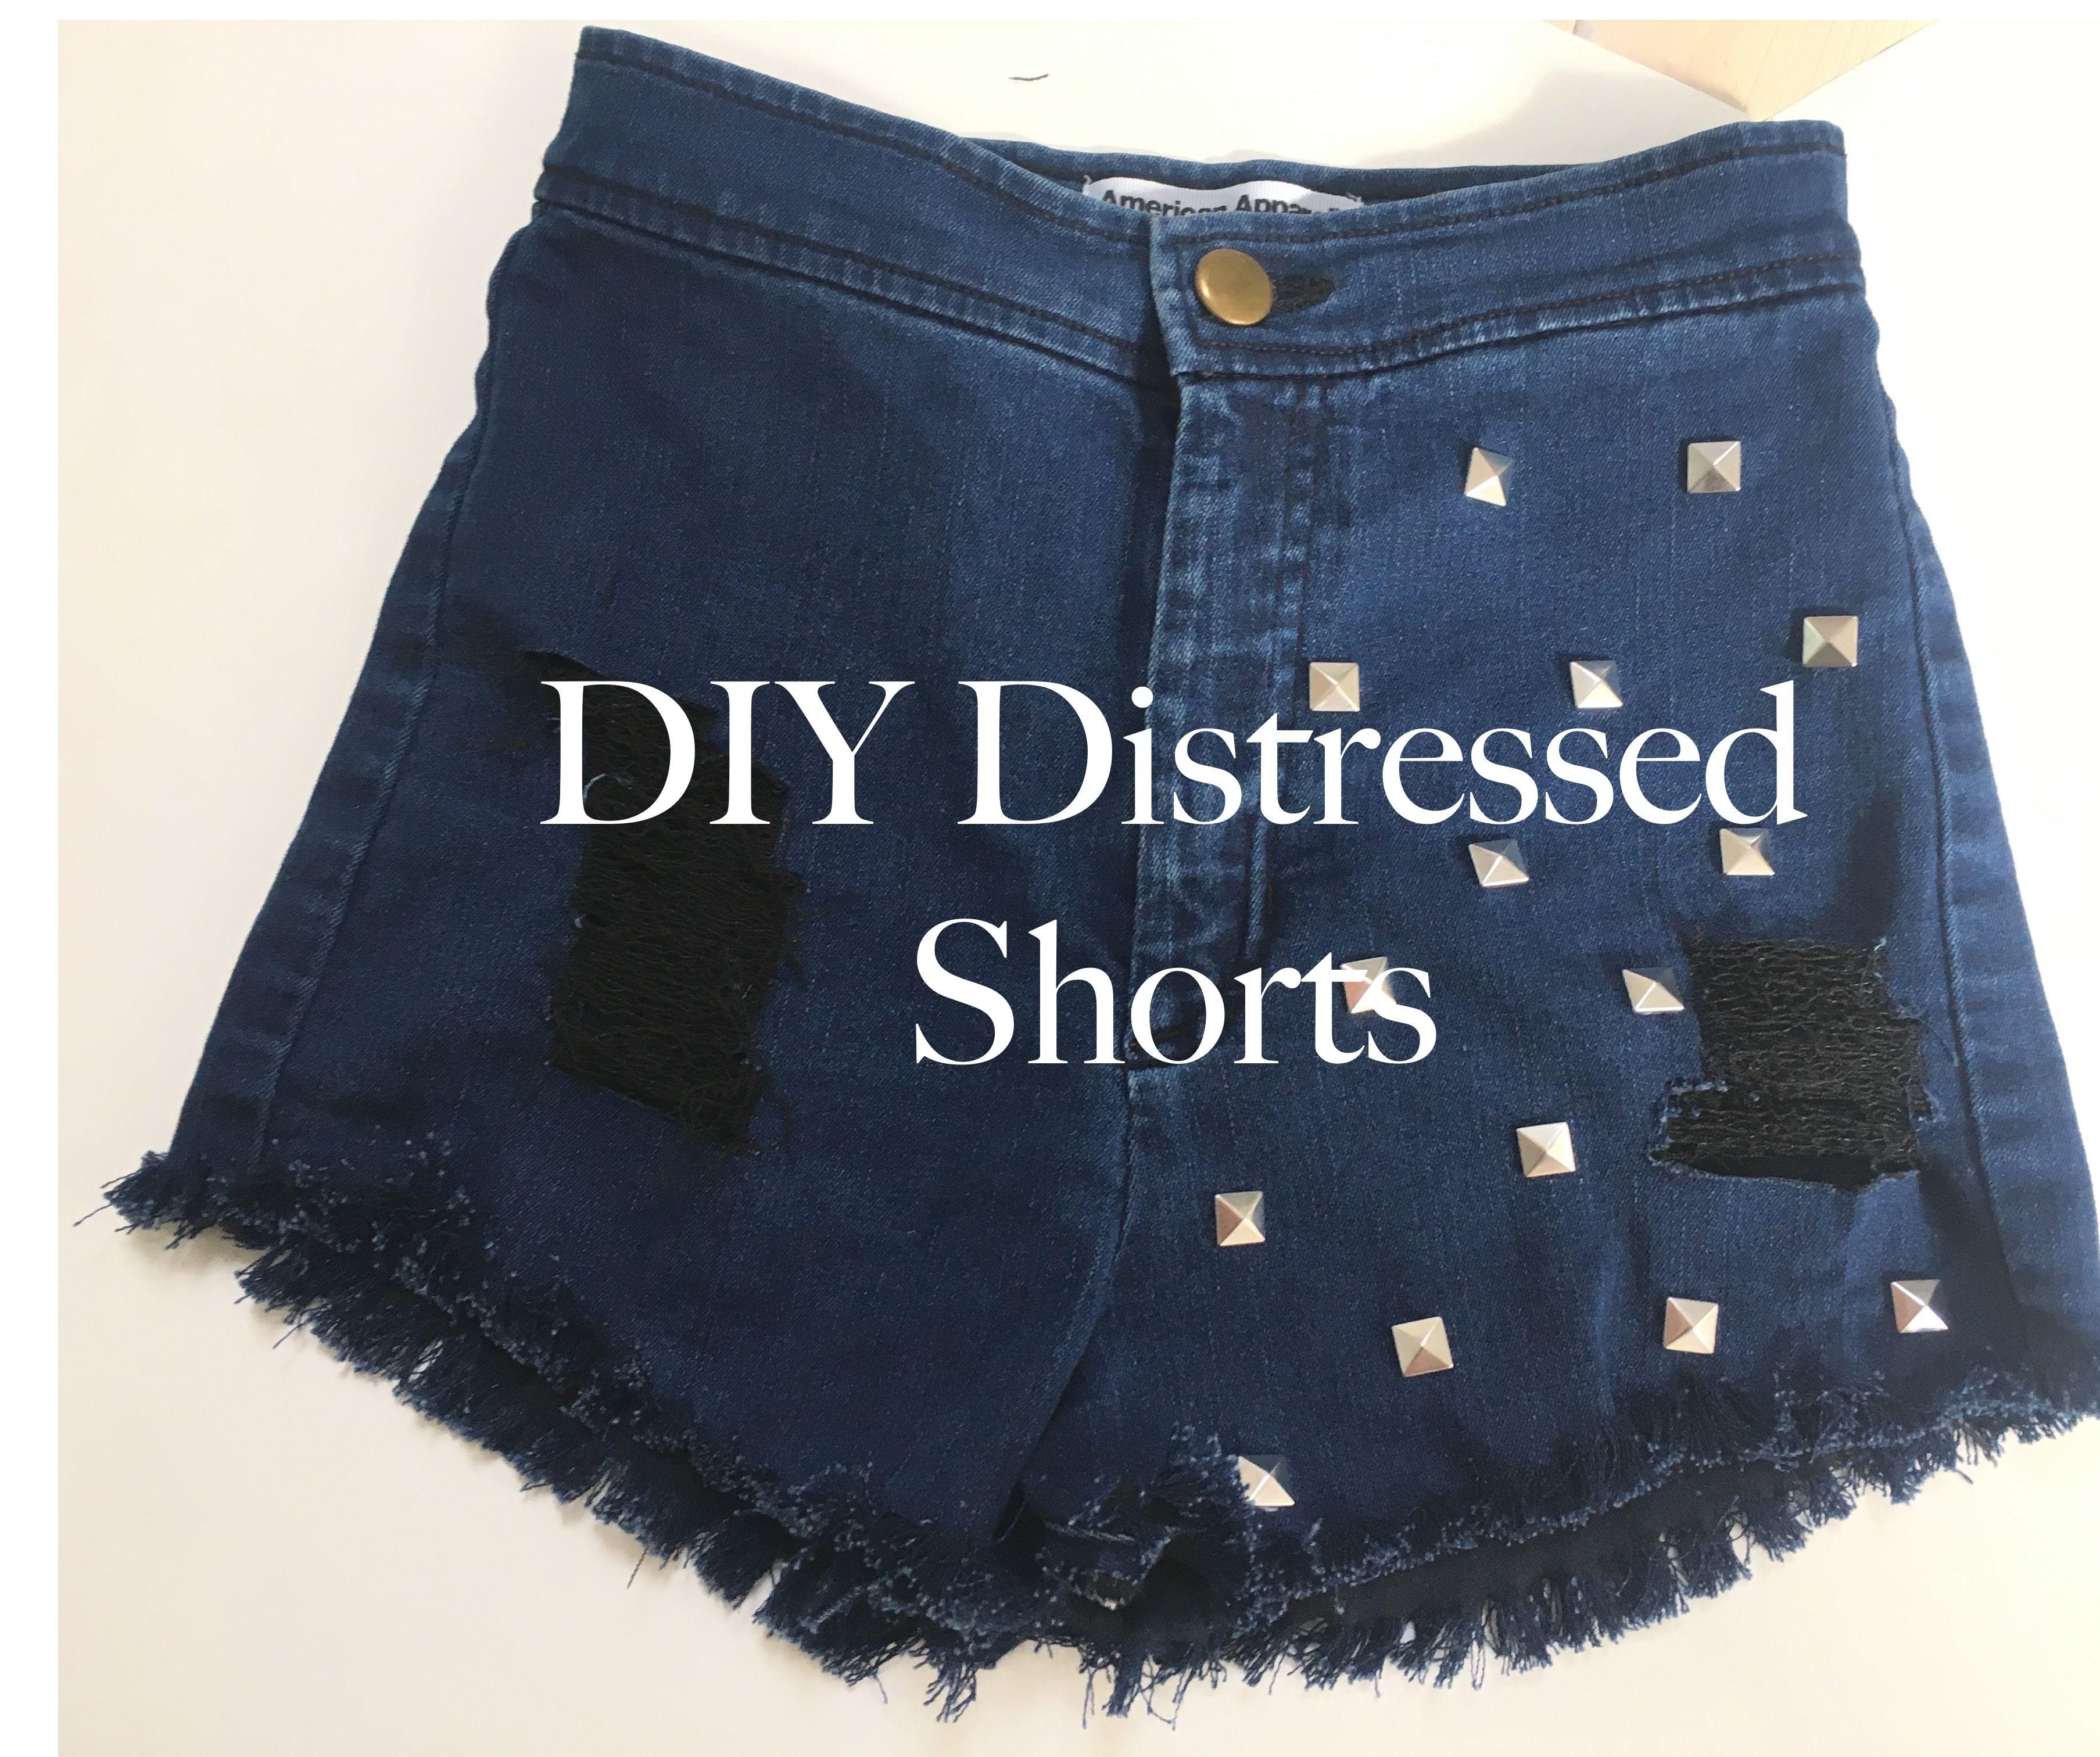 DIY Distressed Shorts